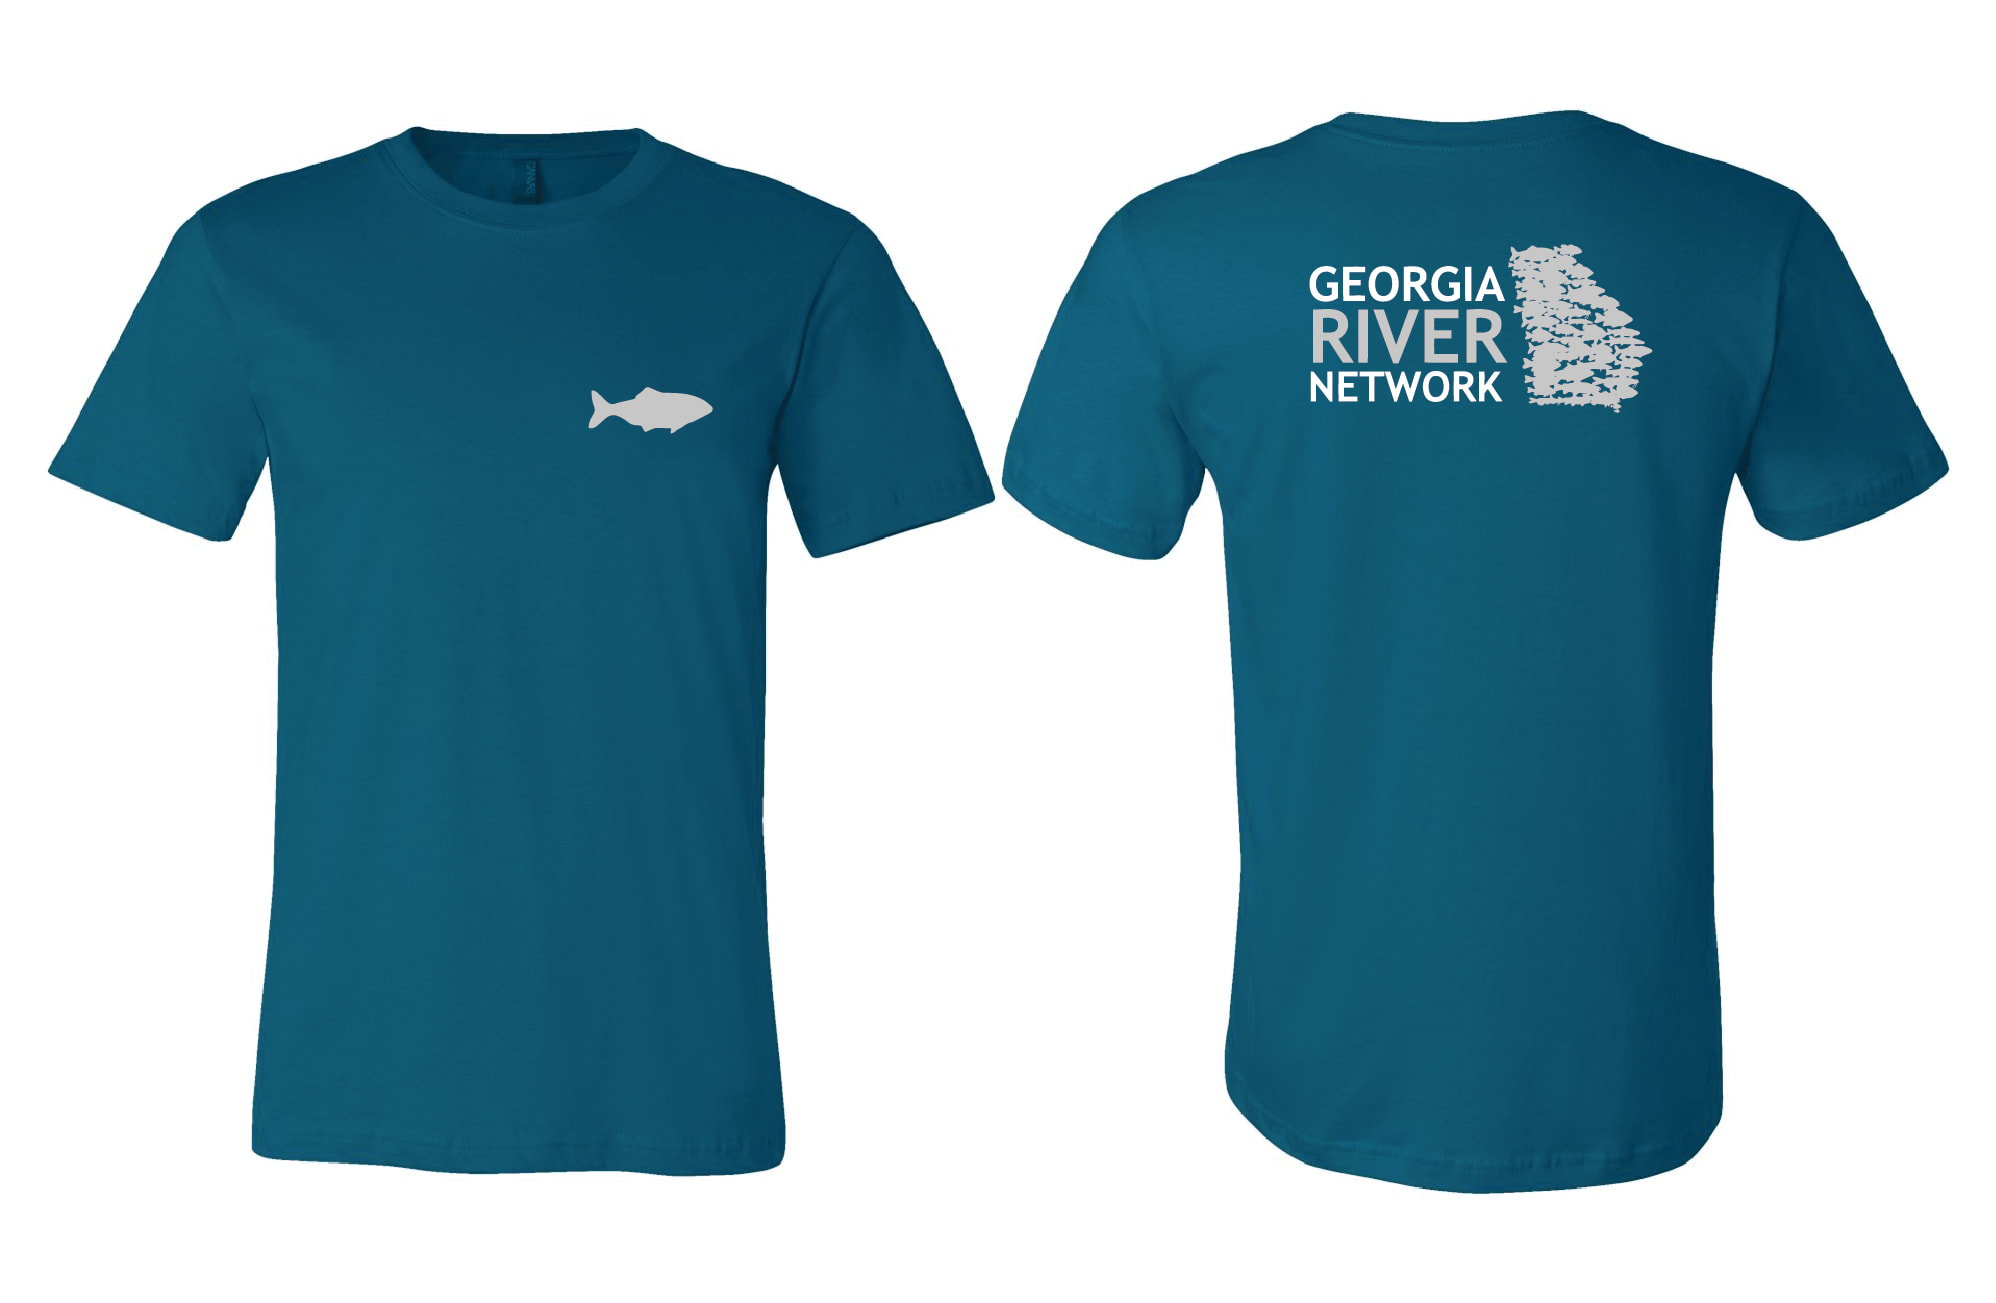 GRN Teal T-shirt